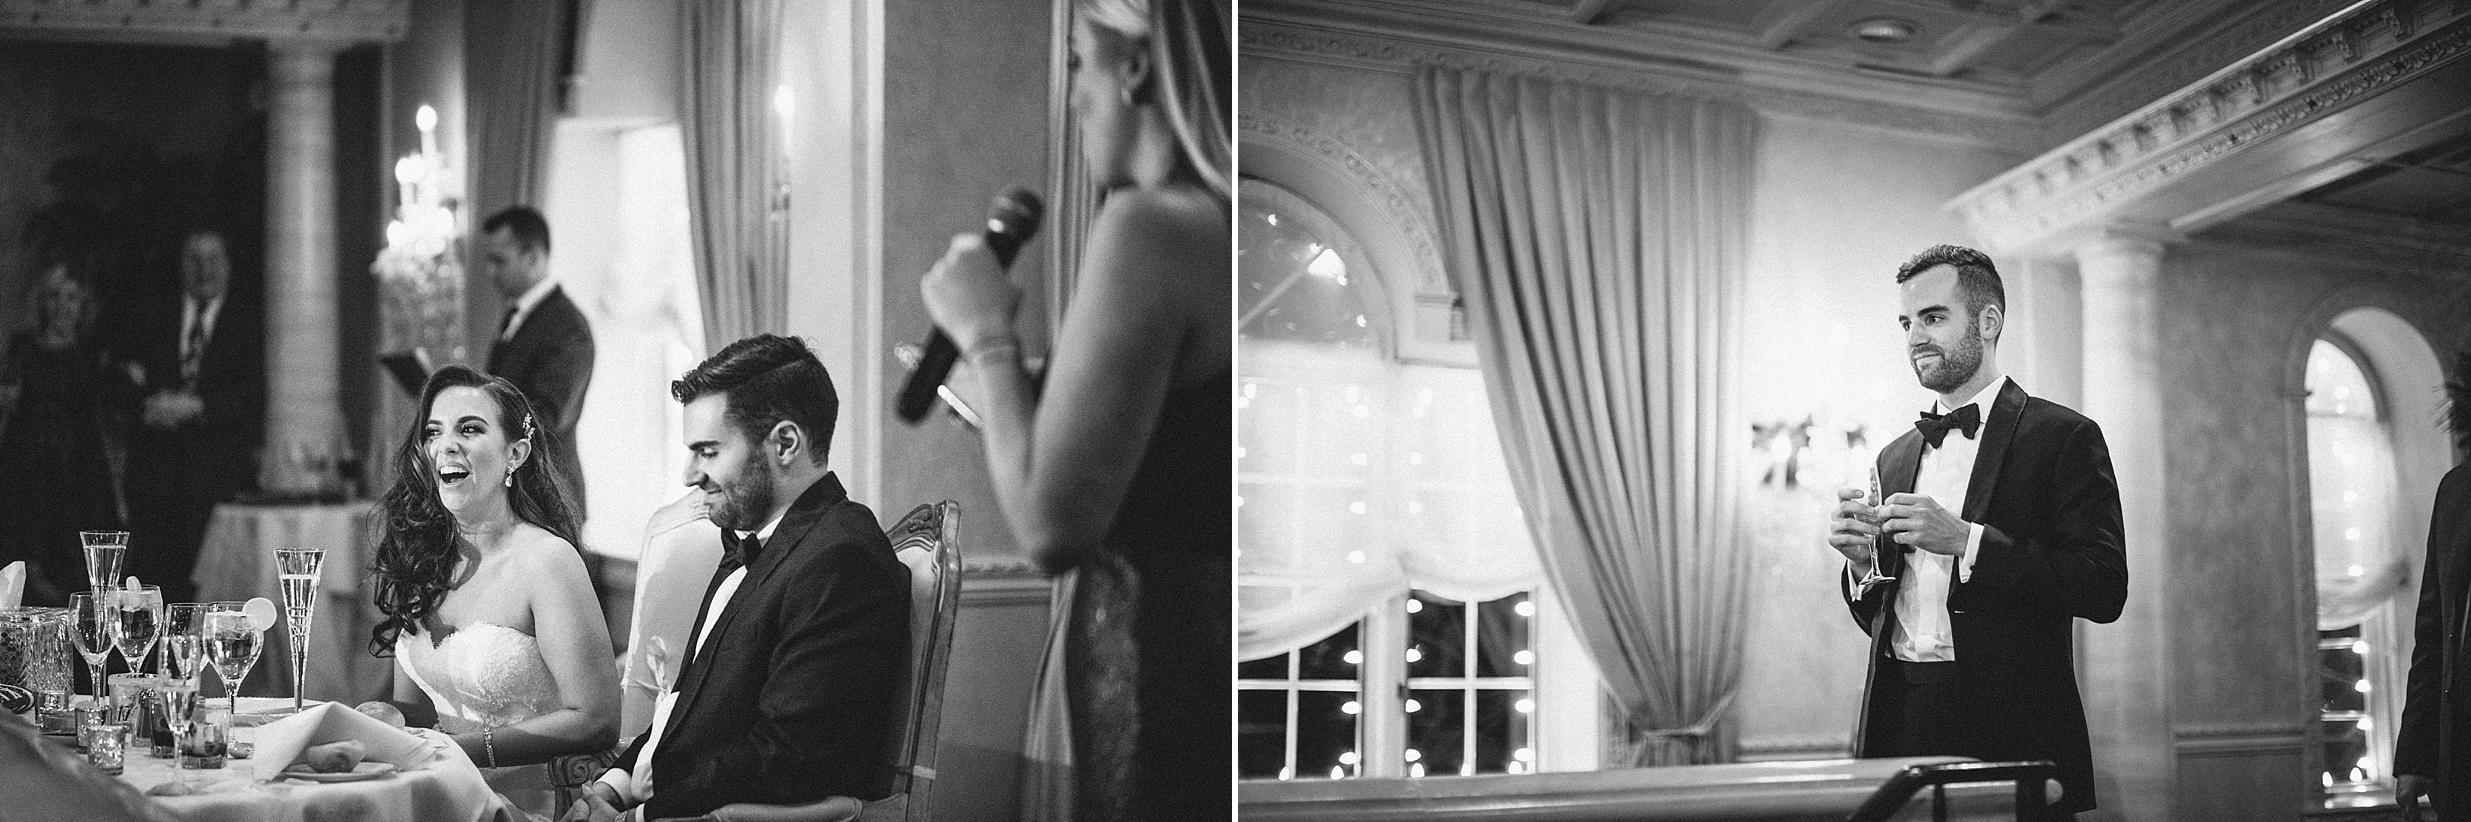 winter-wedding-snow-indoor-ceremony-nj-photographer_0044.jpg